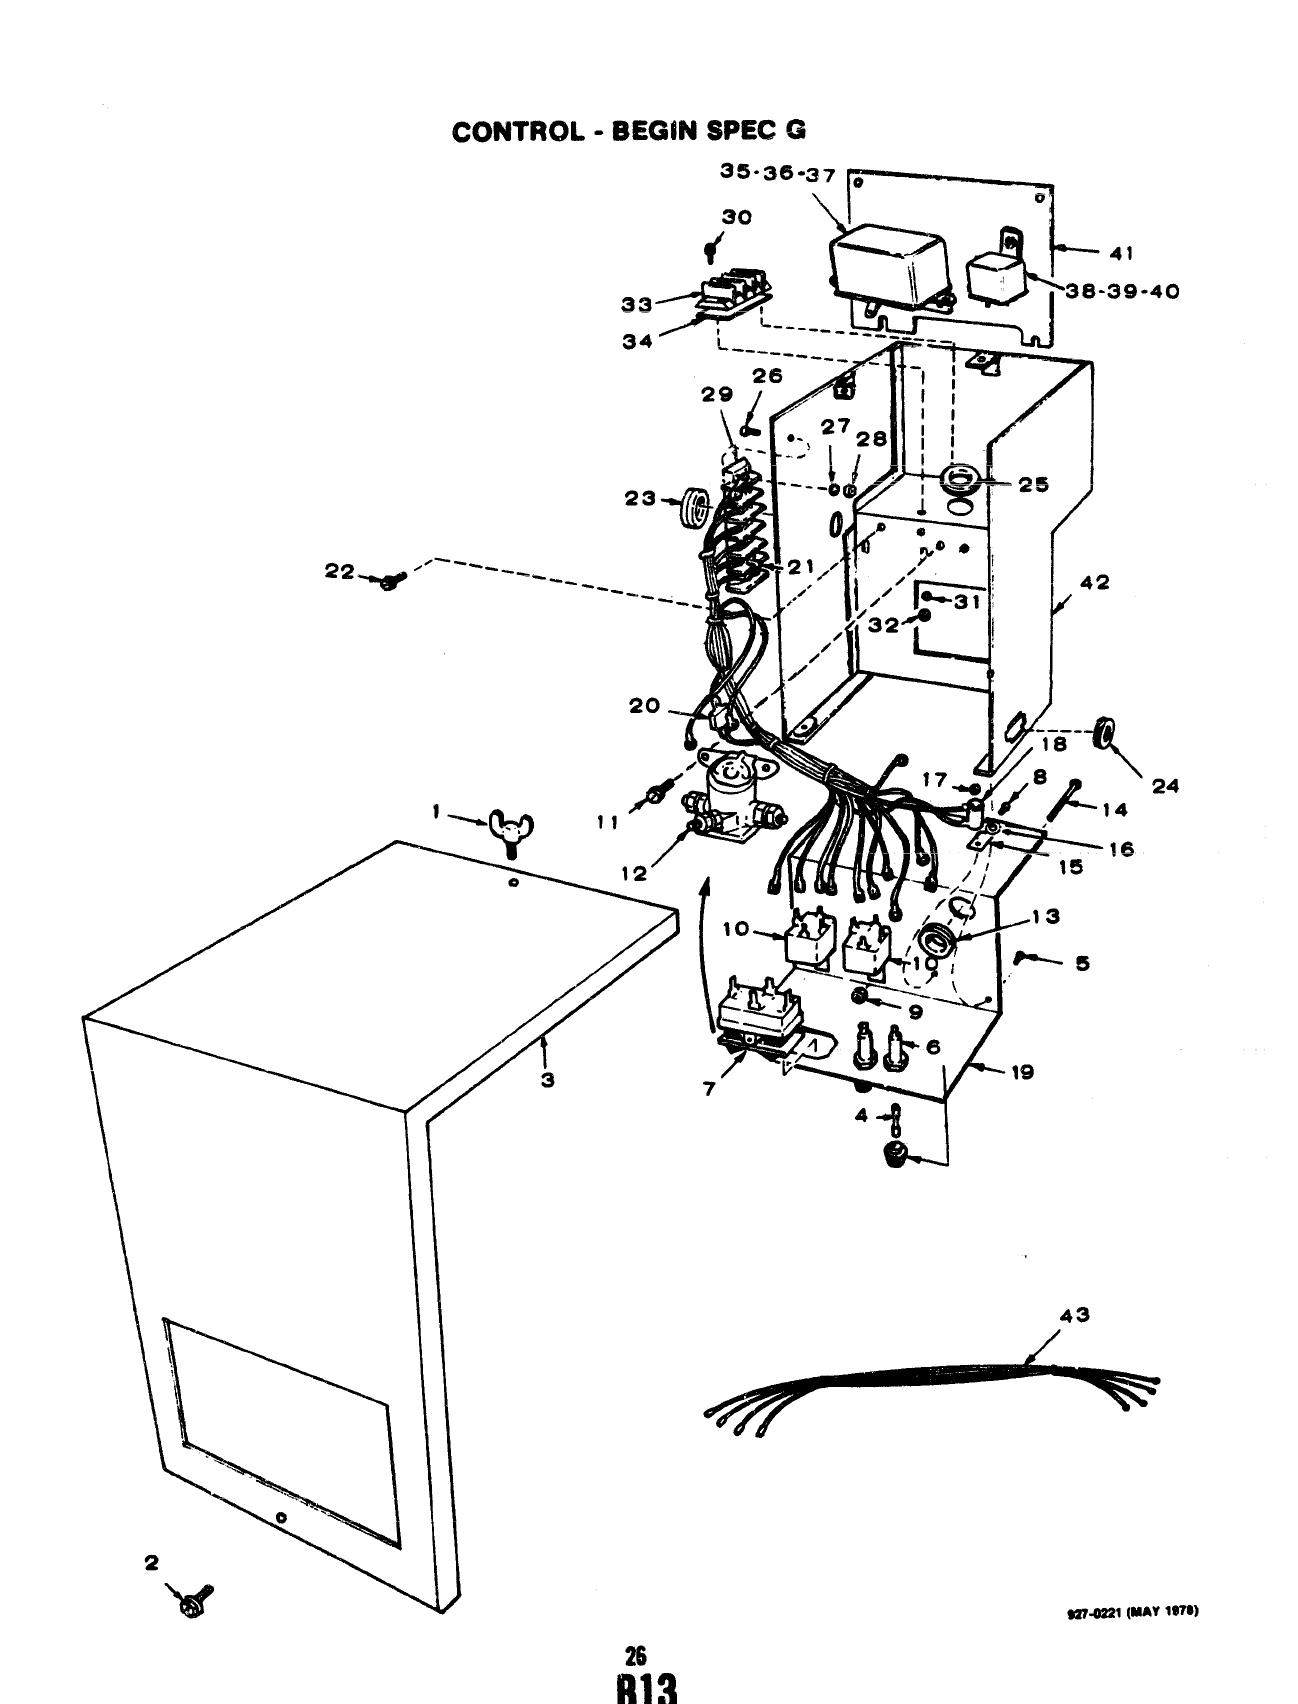 Vdv P 927 Onan Mcck Marine Genset Parts Manual